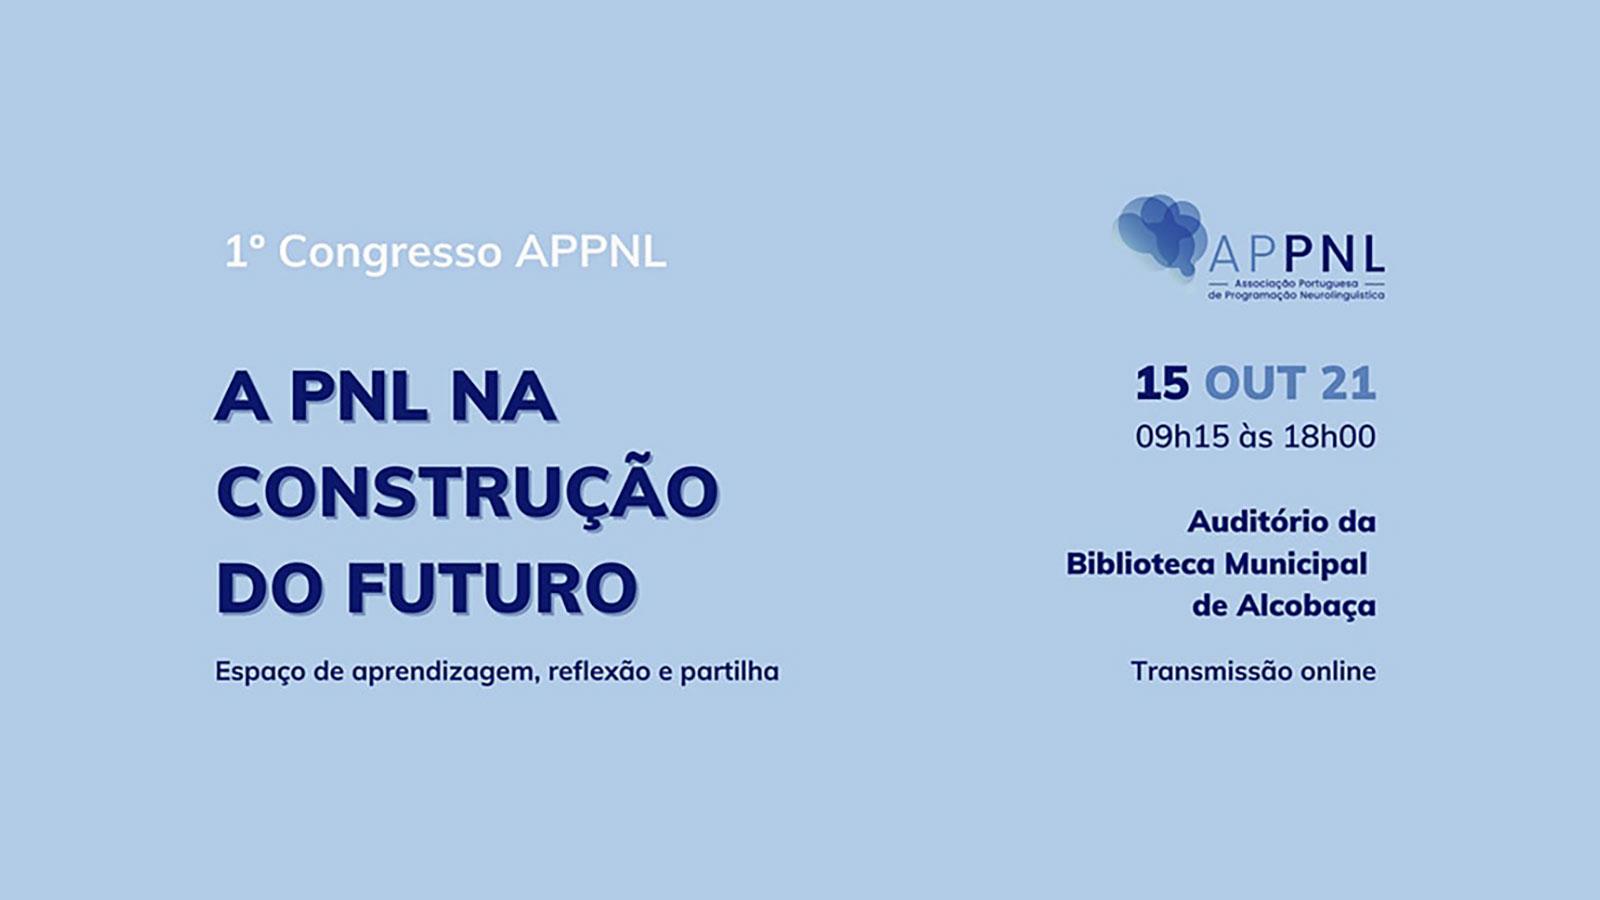 1º Congresso APPNL